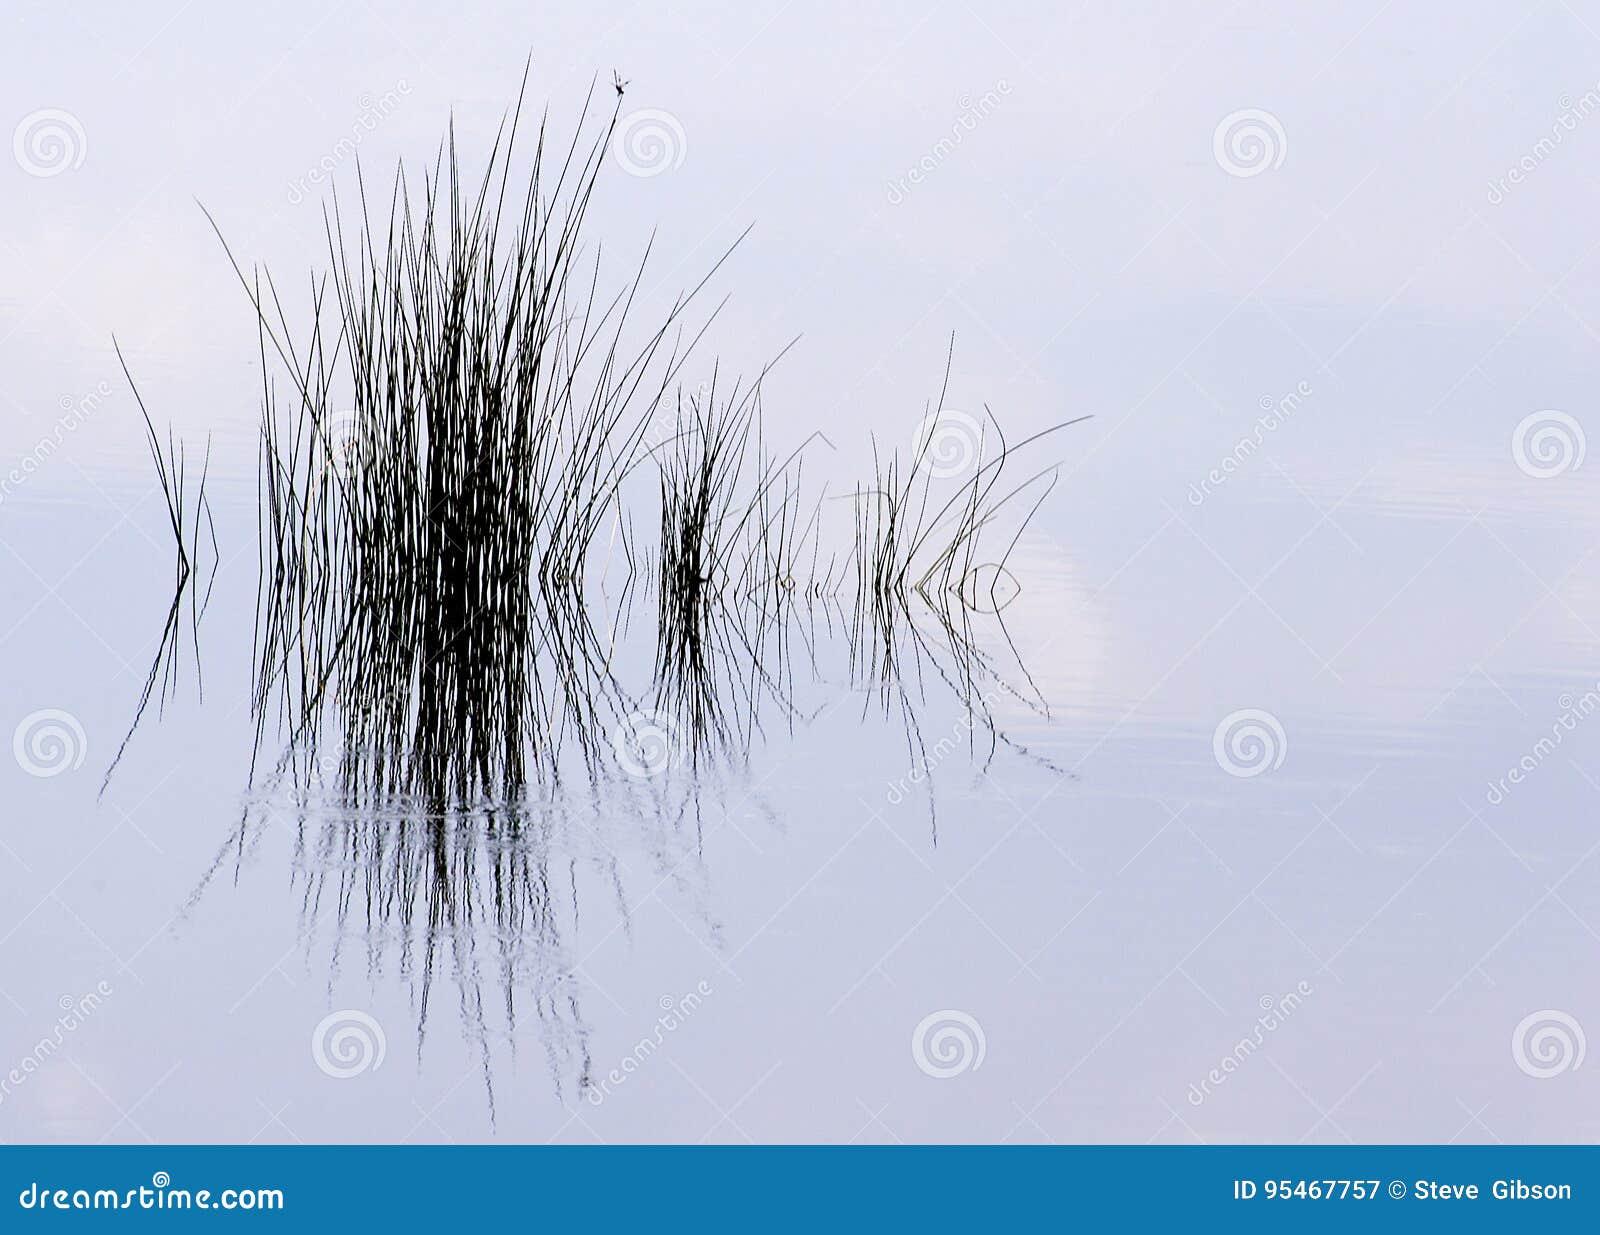 Pond Grass Reflection